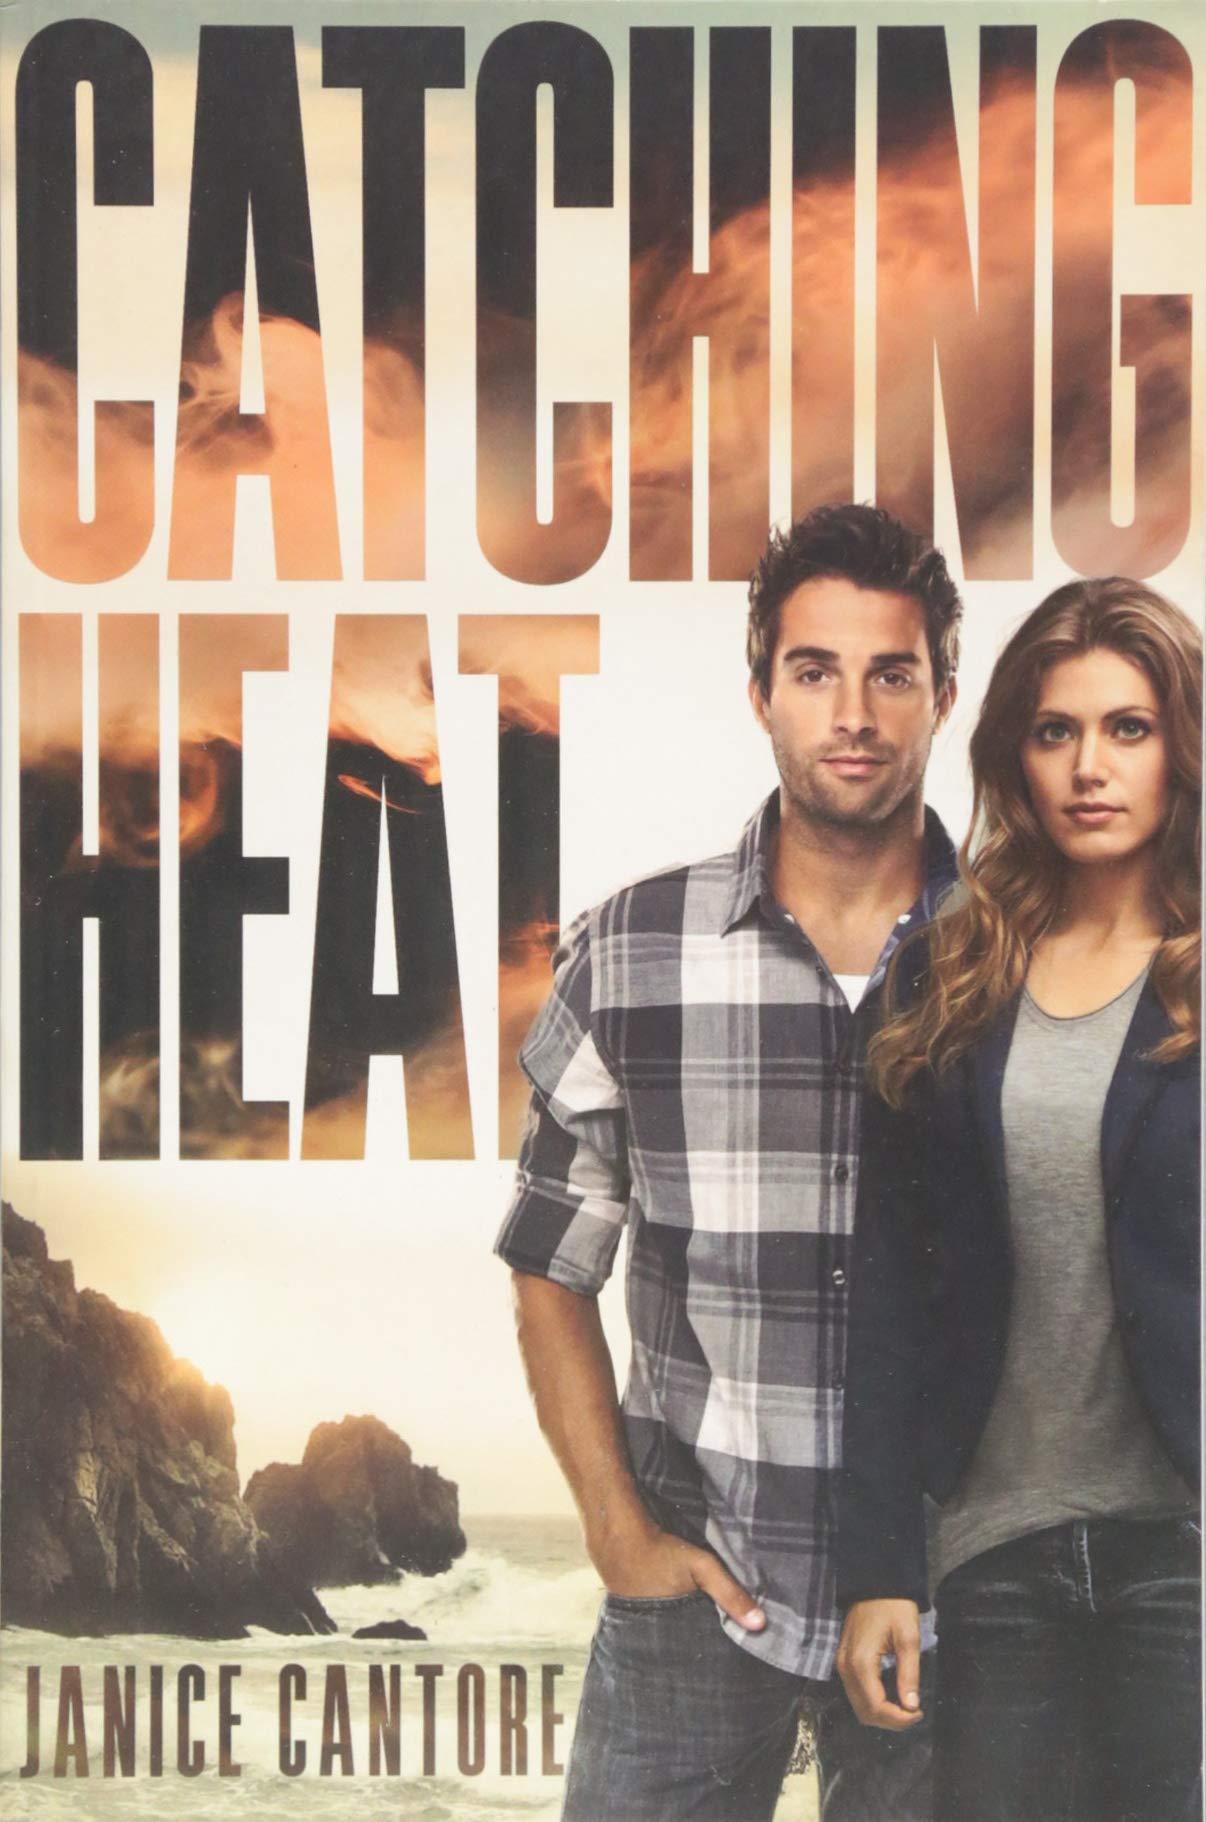 Catching Heat (Cold Case Justice) ePub fb2 ebook